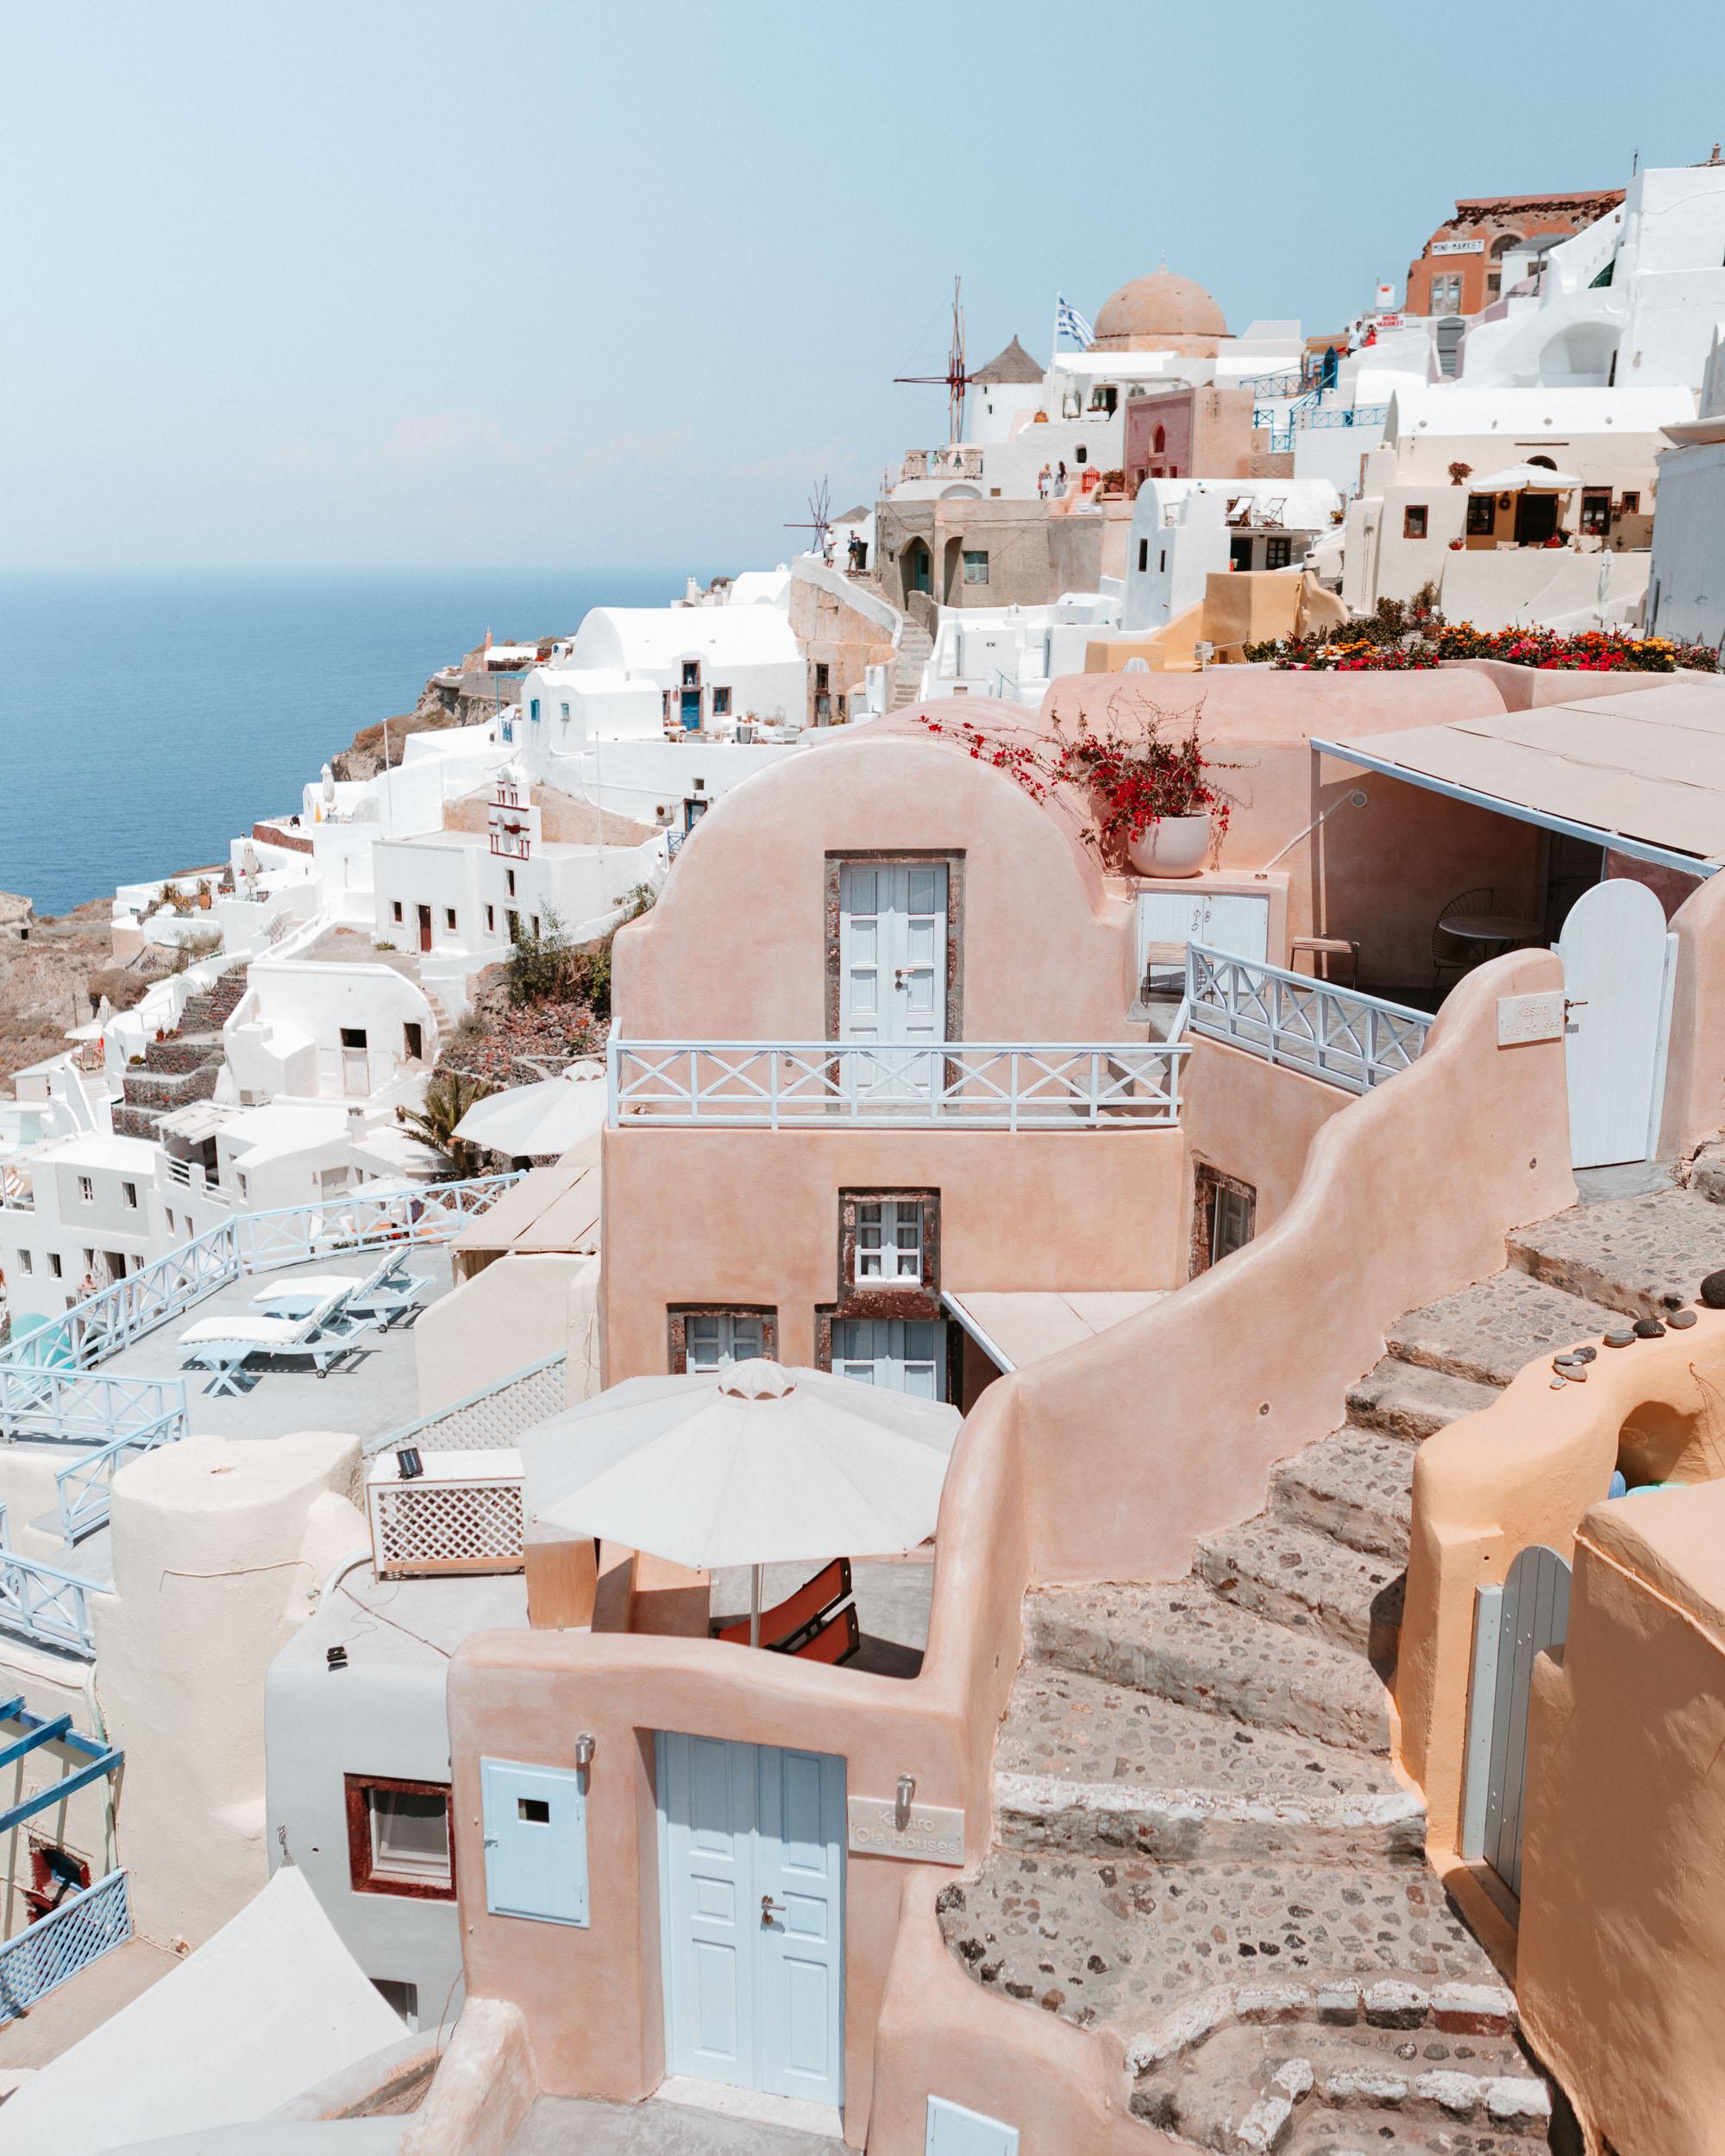 One of the best greek islands to visit - Santorini via @finduslost